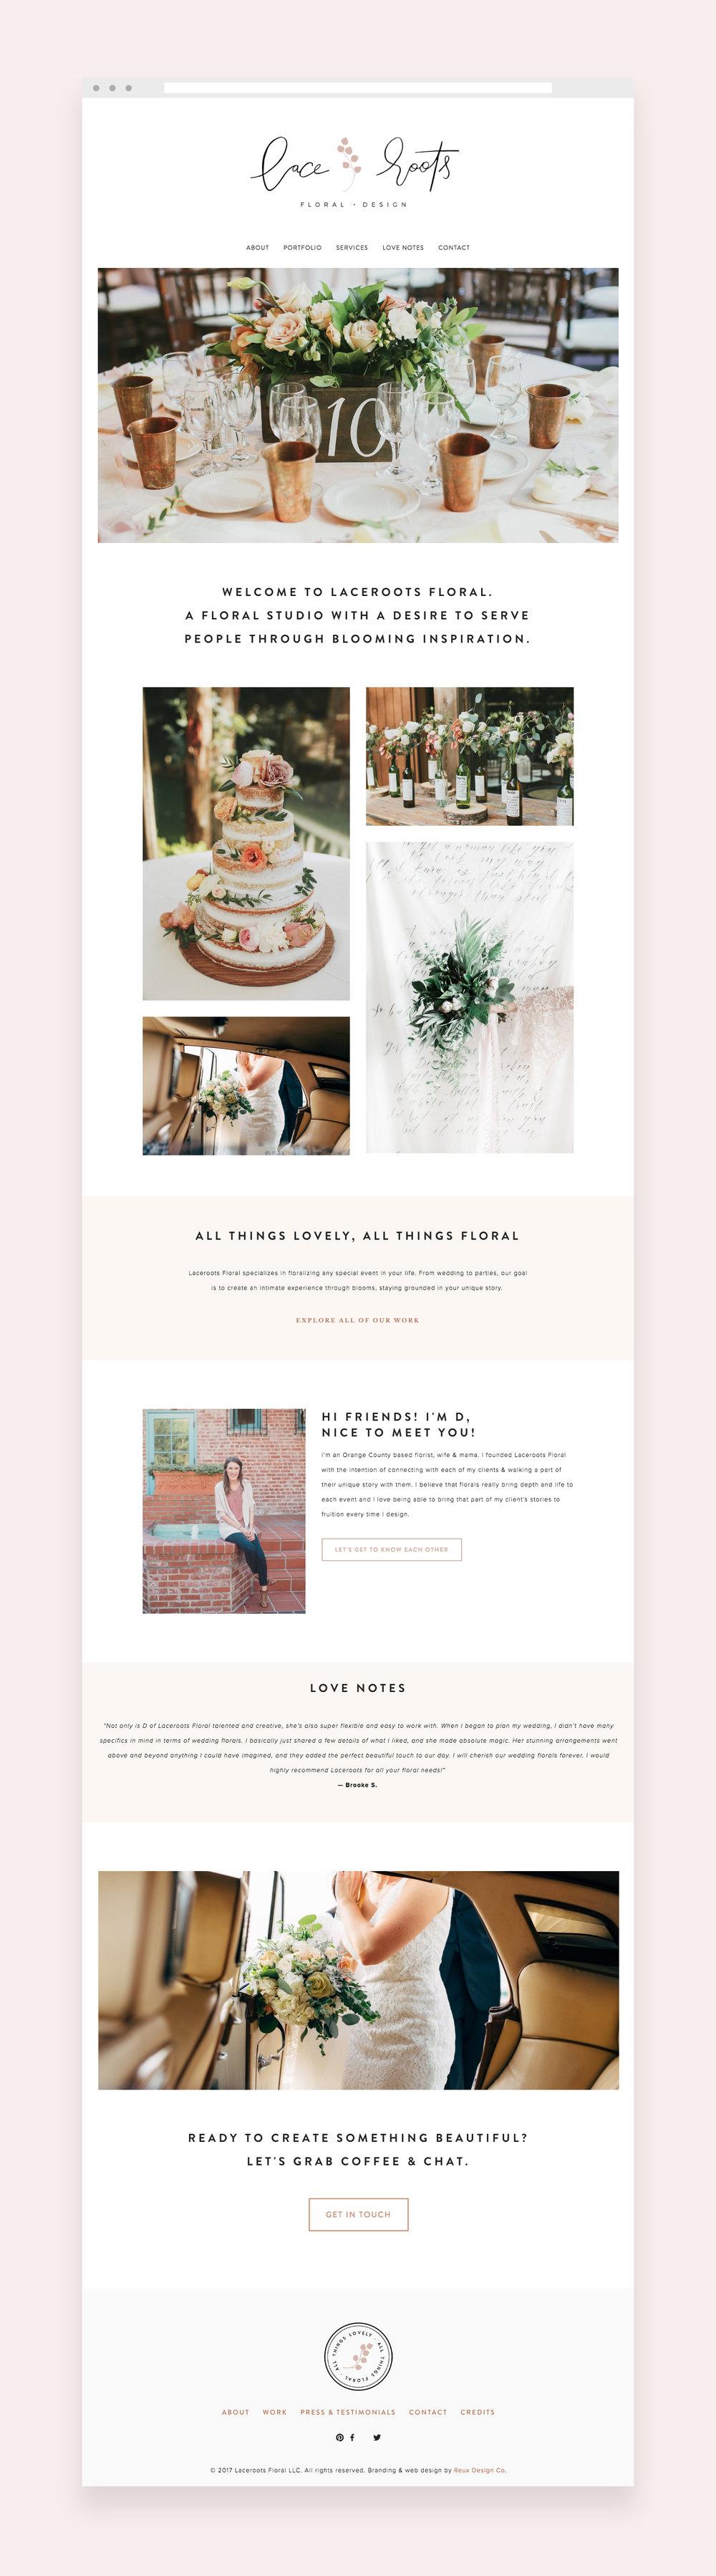 Laceroots Floral website design on squarespace | Reux Design Co.